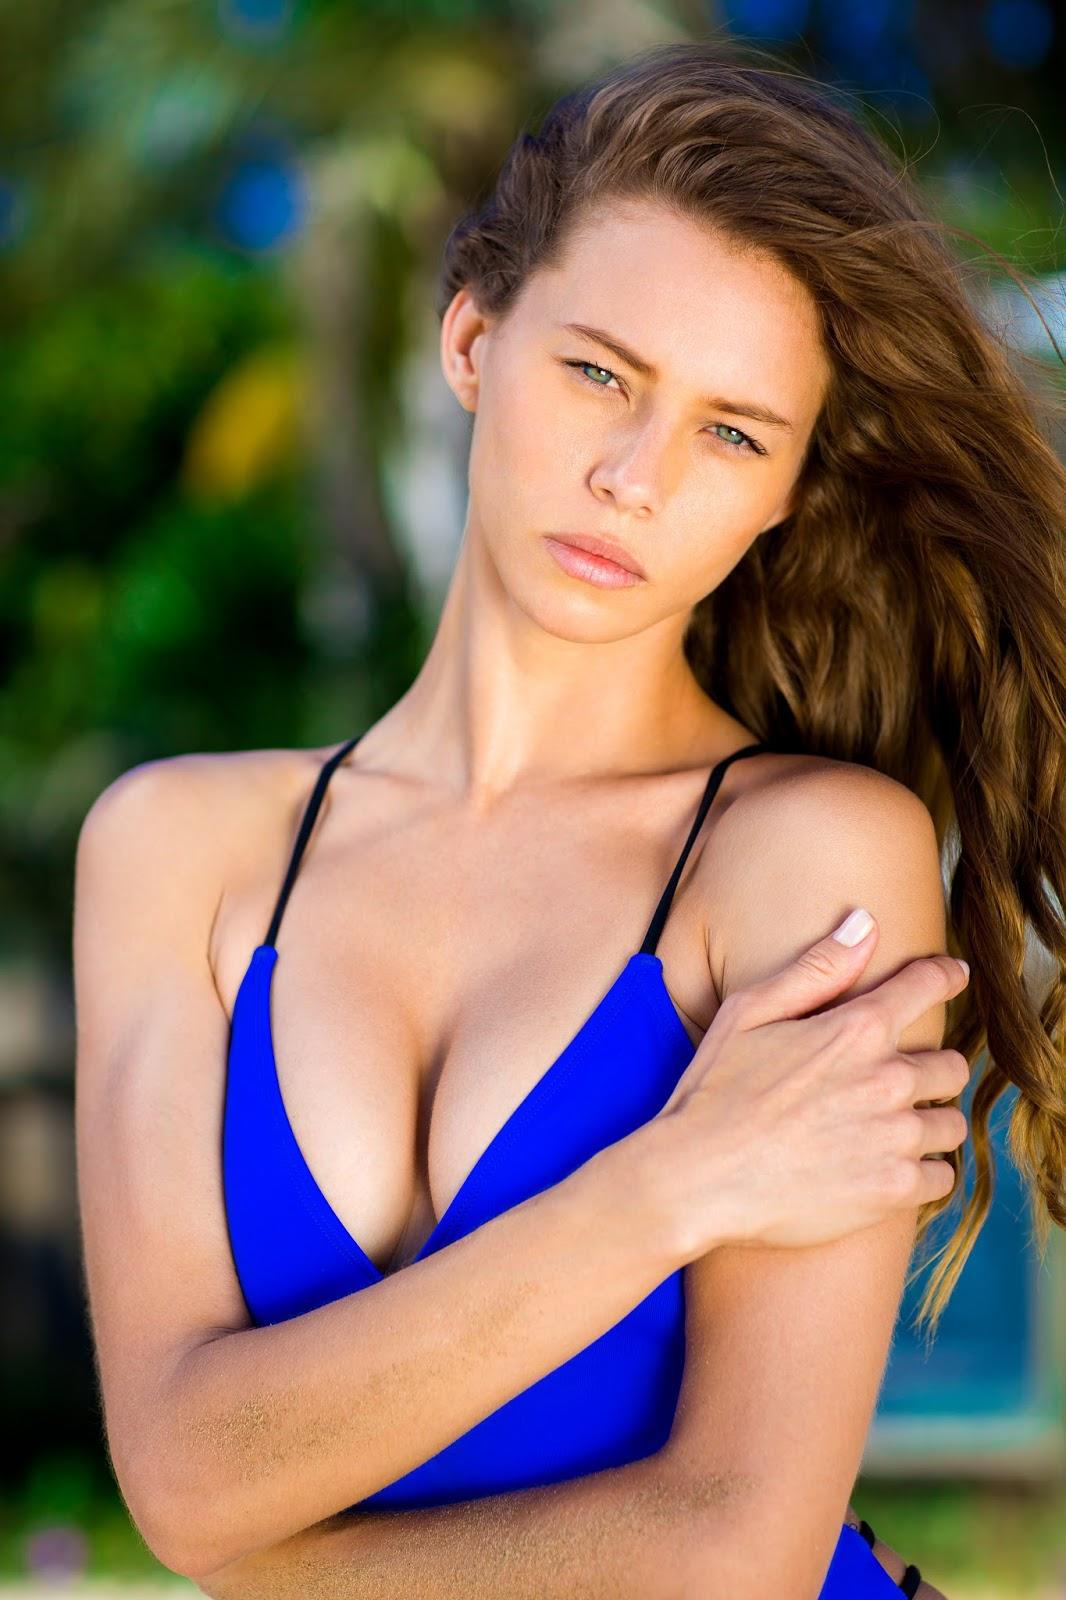 Janaina Reis nudes (21 photos), video Tits, Snapchat, braless 2017